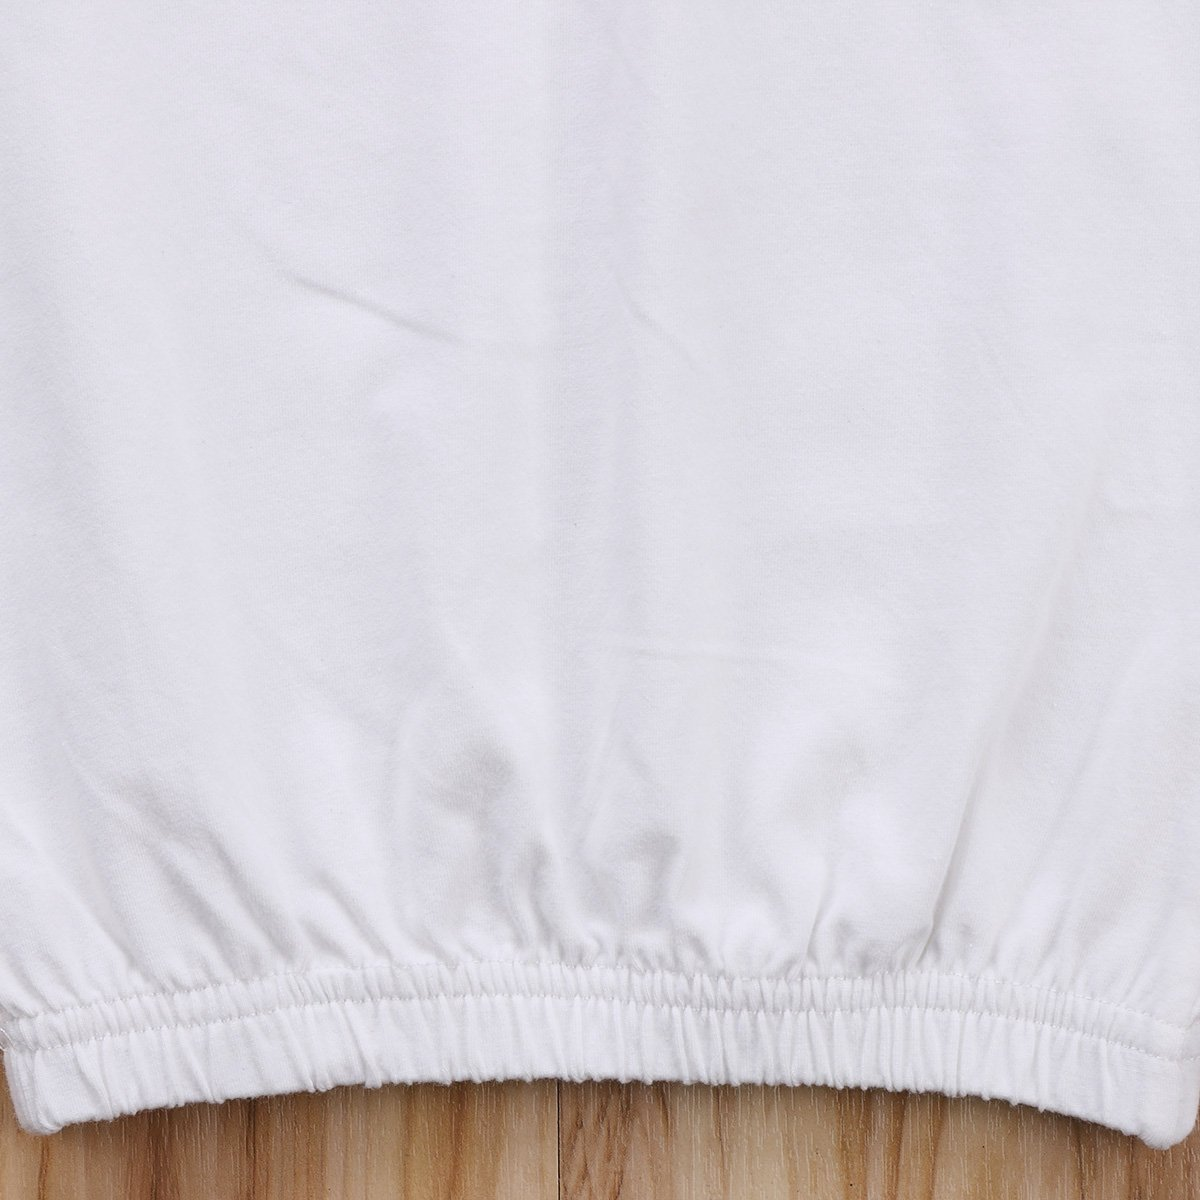 gllive 2PCS Newborn Baby Girl Princess Cotton Sleepwear Pajamas Robe Gown Headband Clothes Outfit